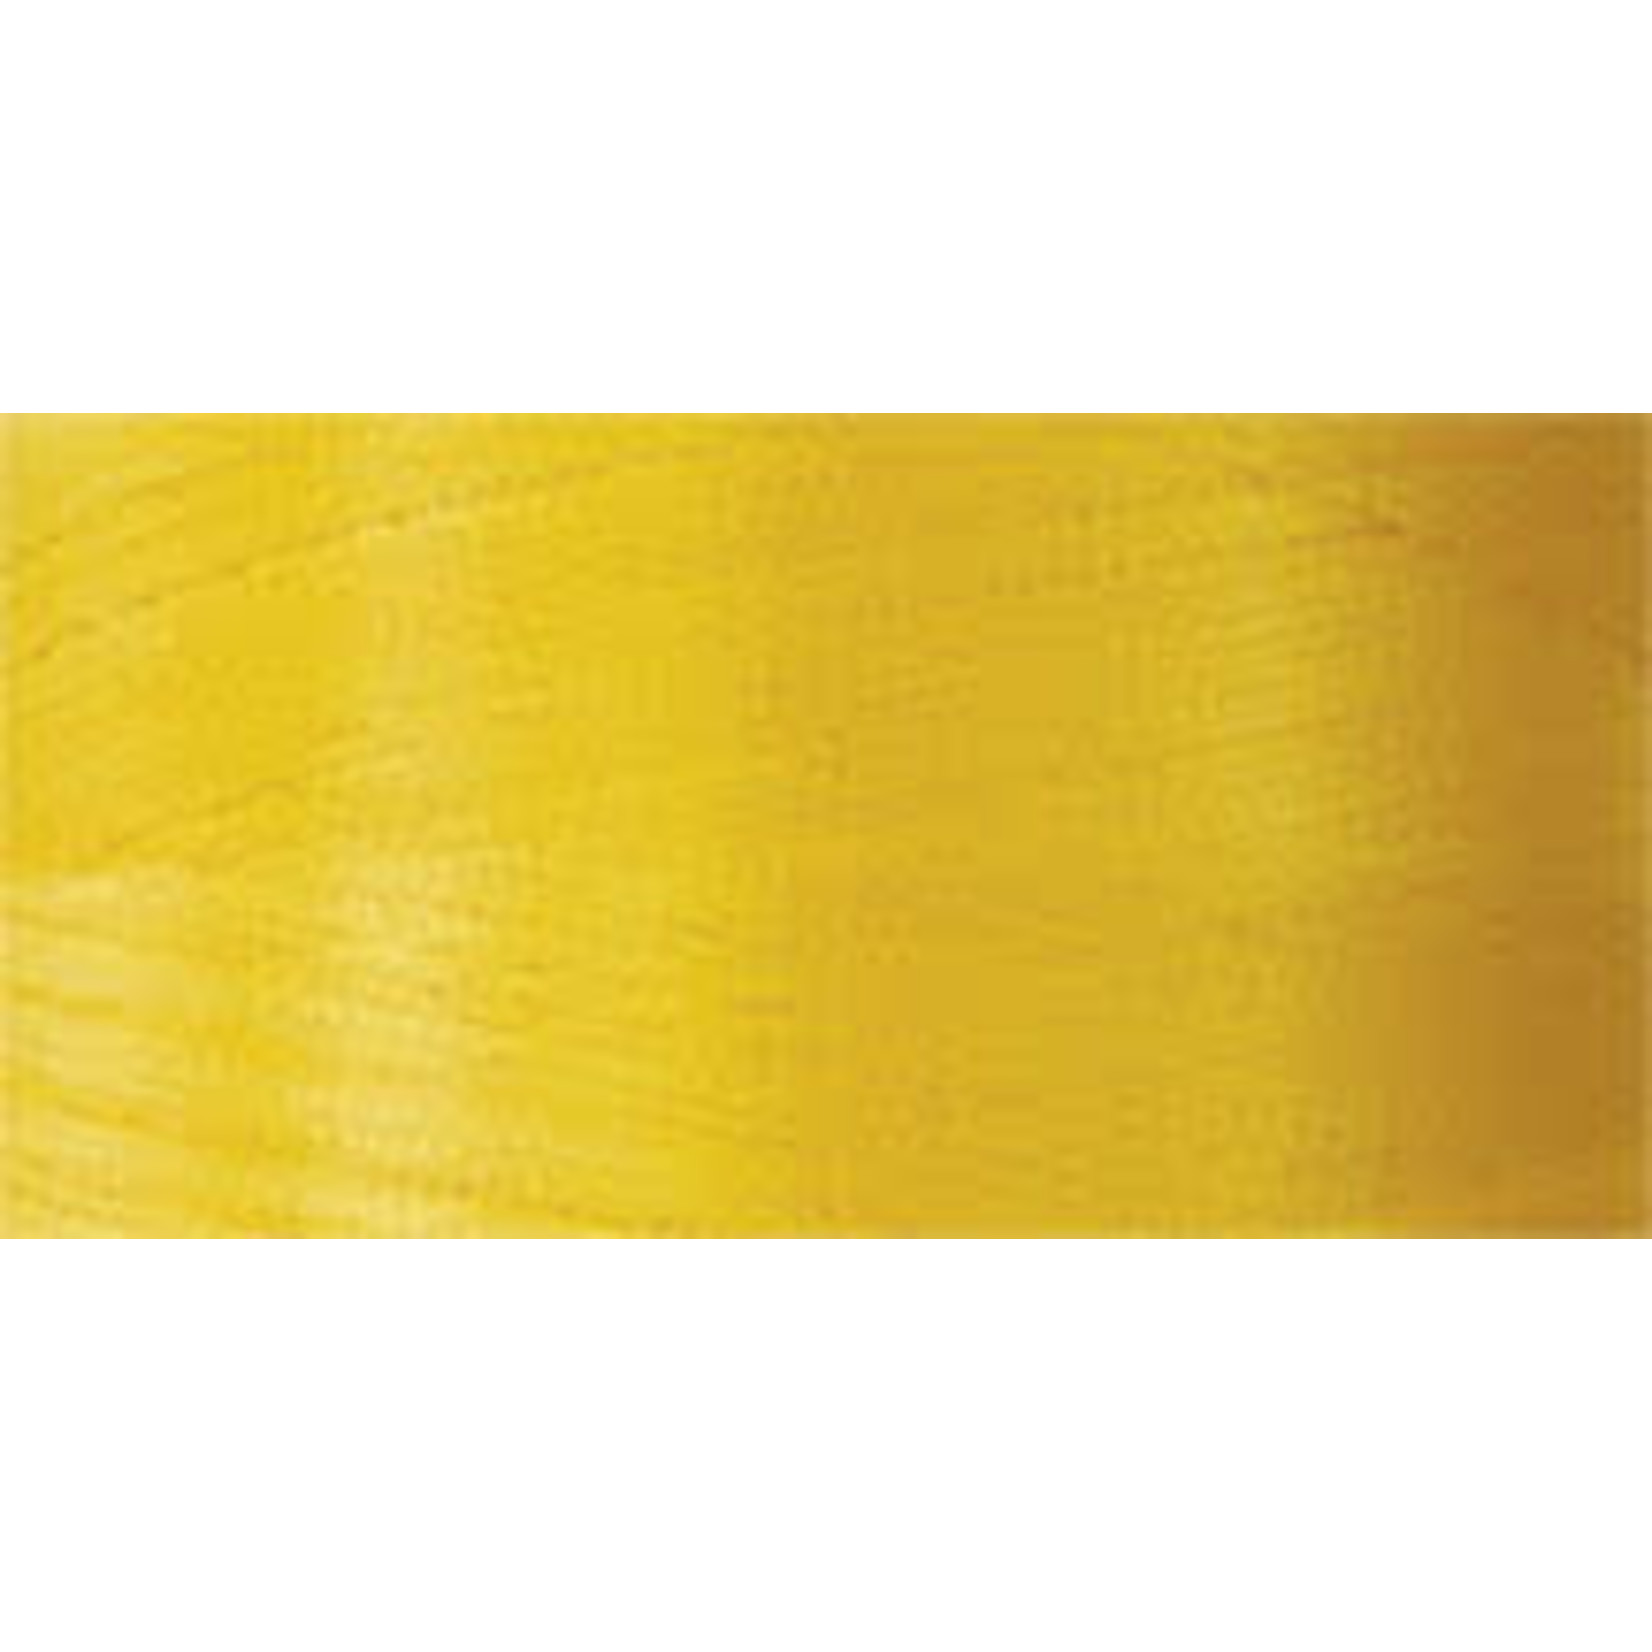 Superior Threads Bottom Line - #60 - 1300 m - 641 Bright Yellow